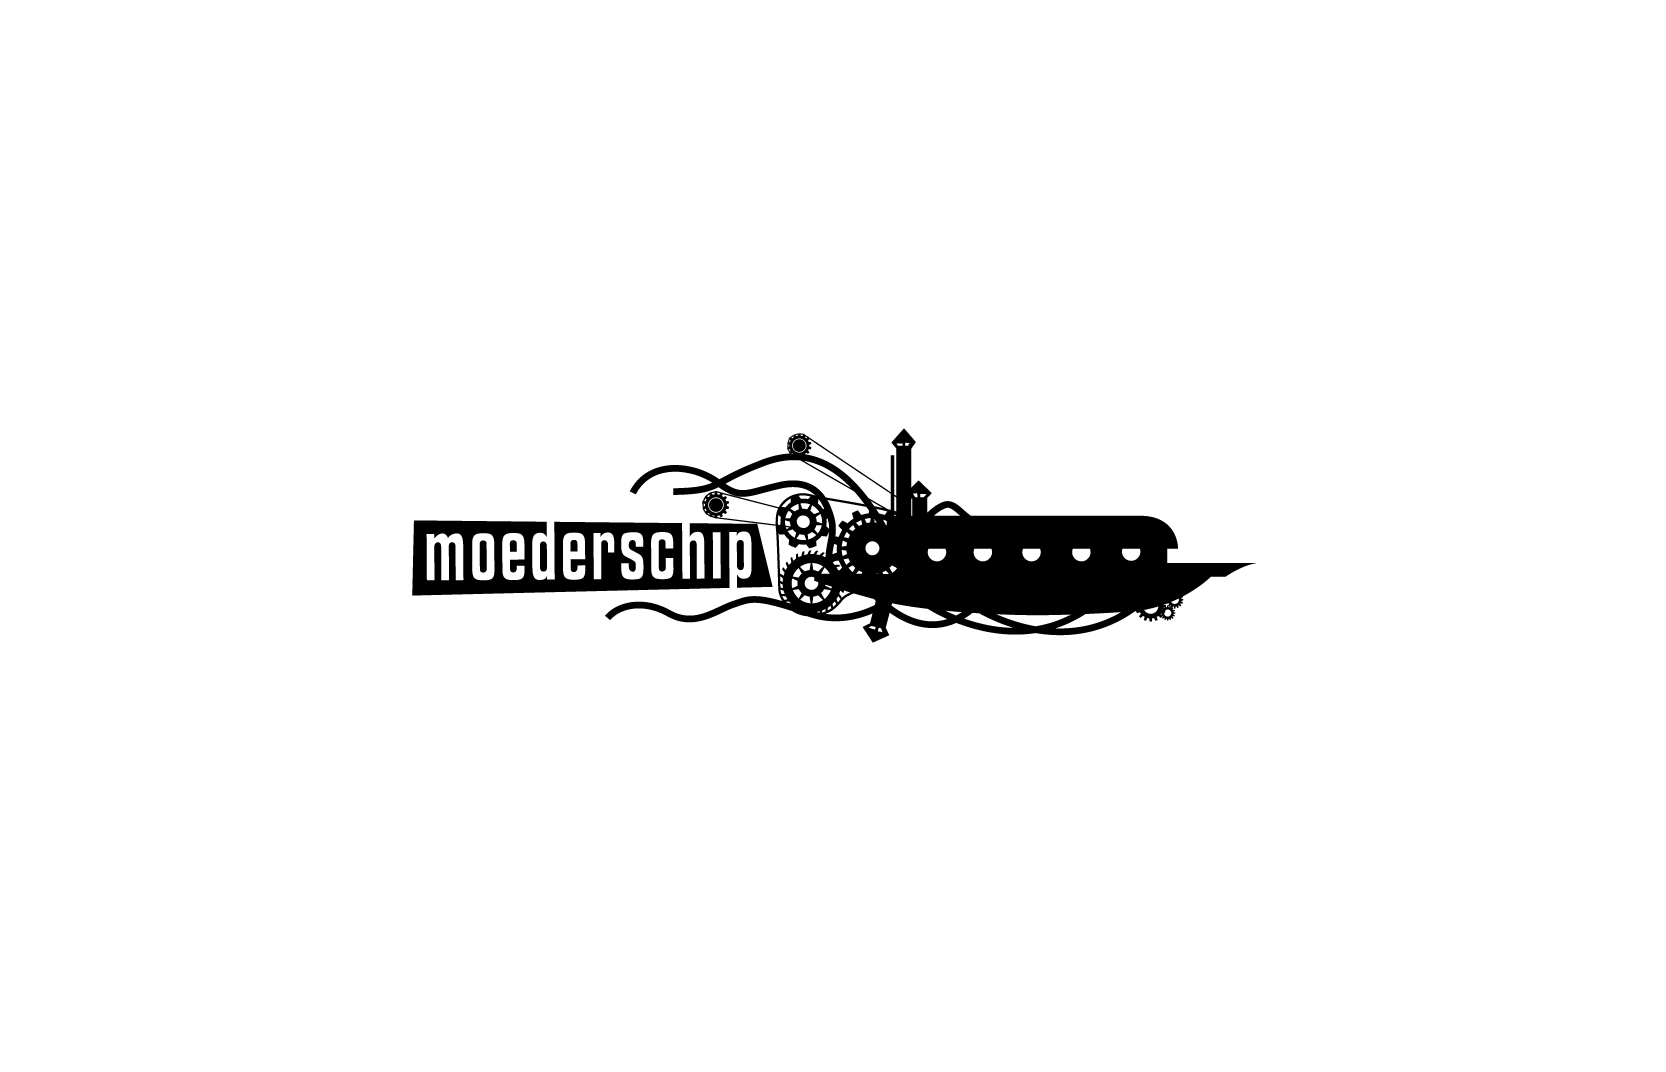 multi_moederschip_logo1